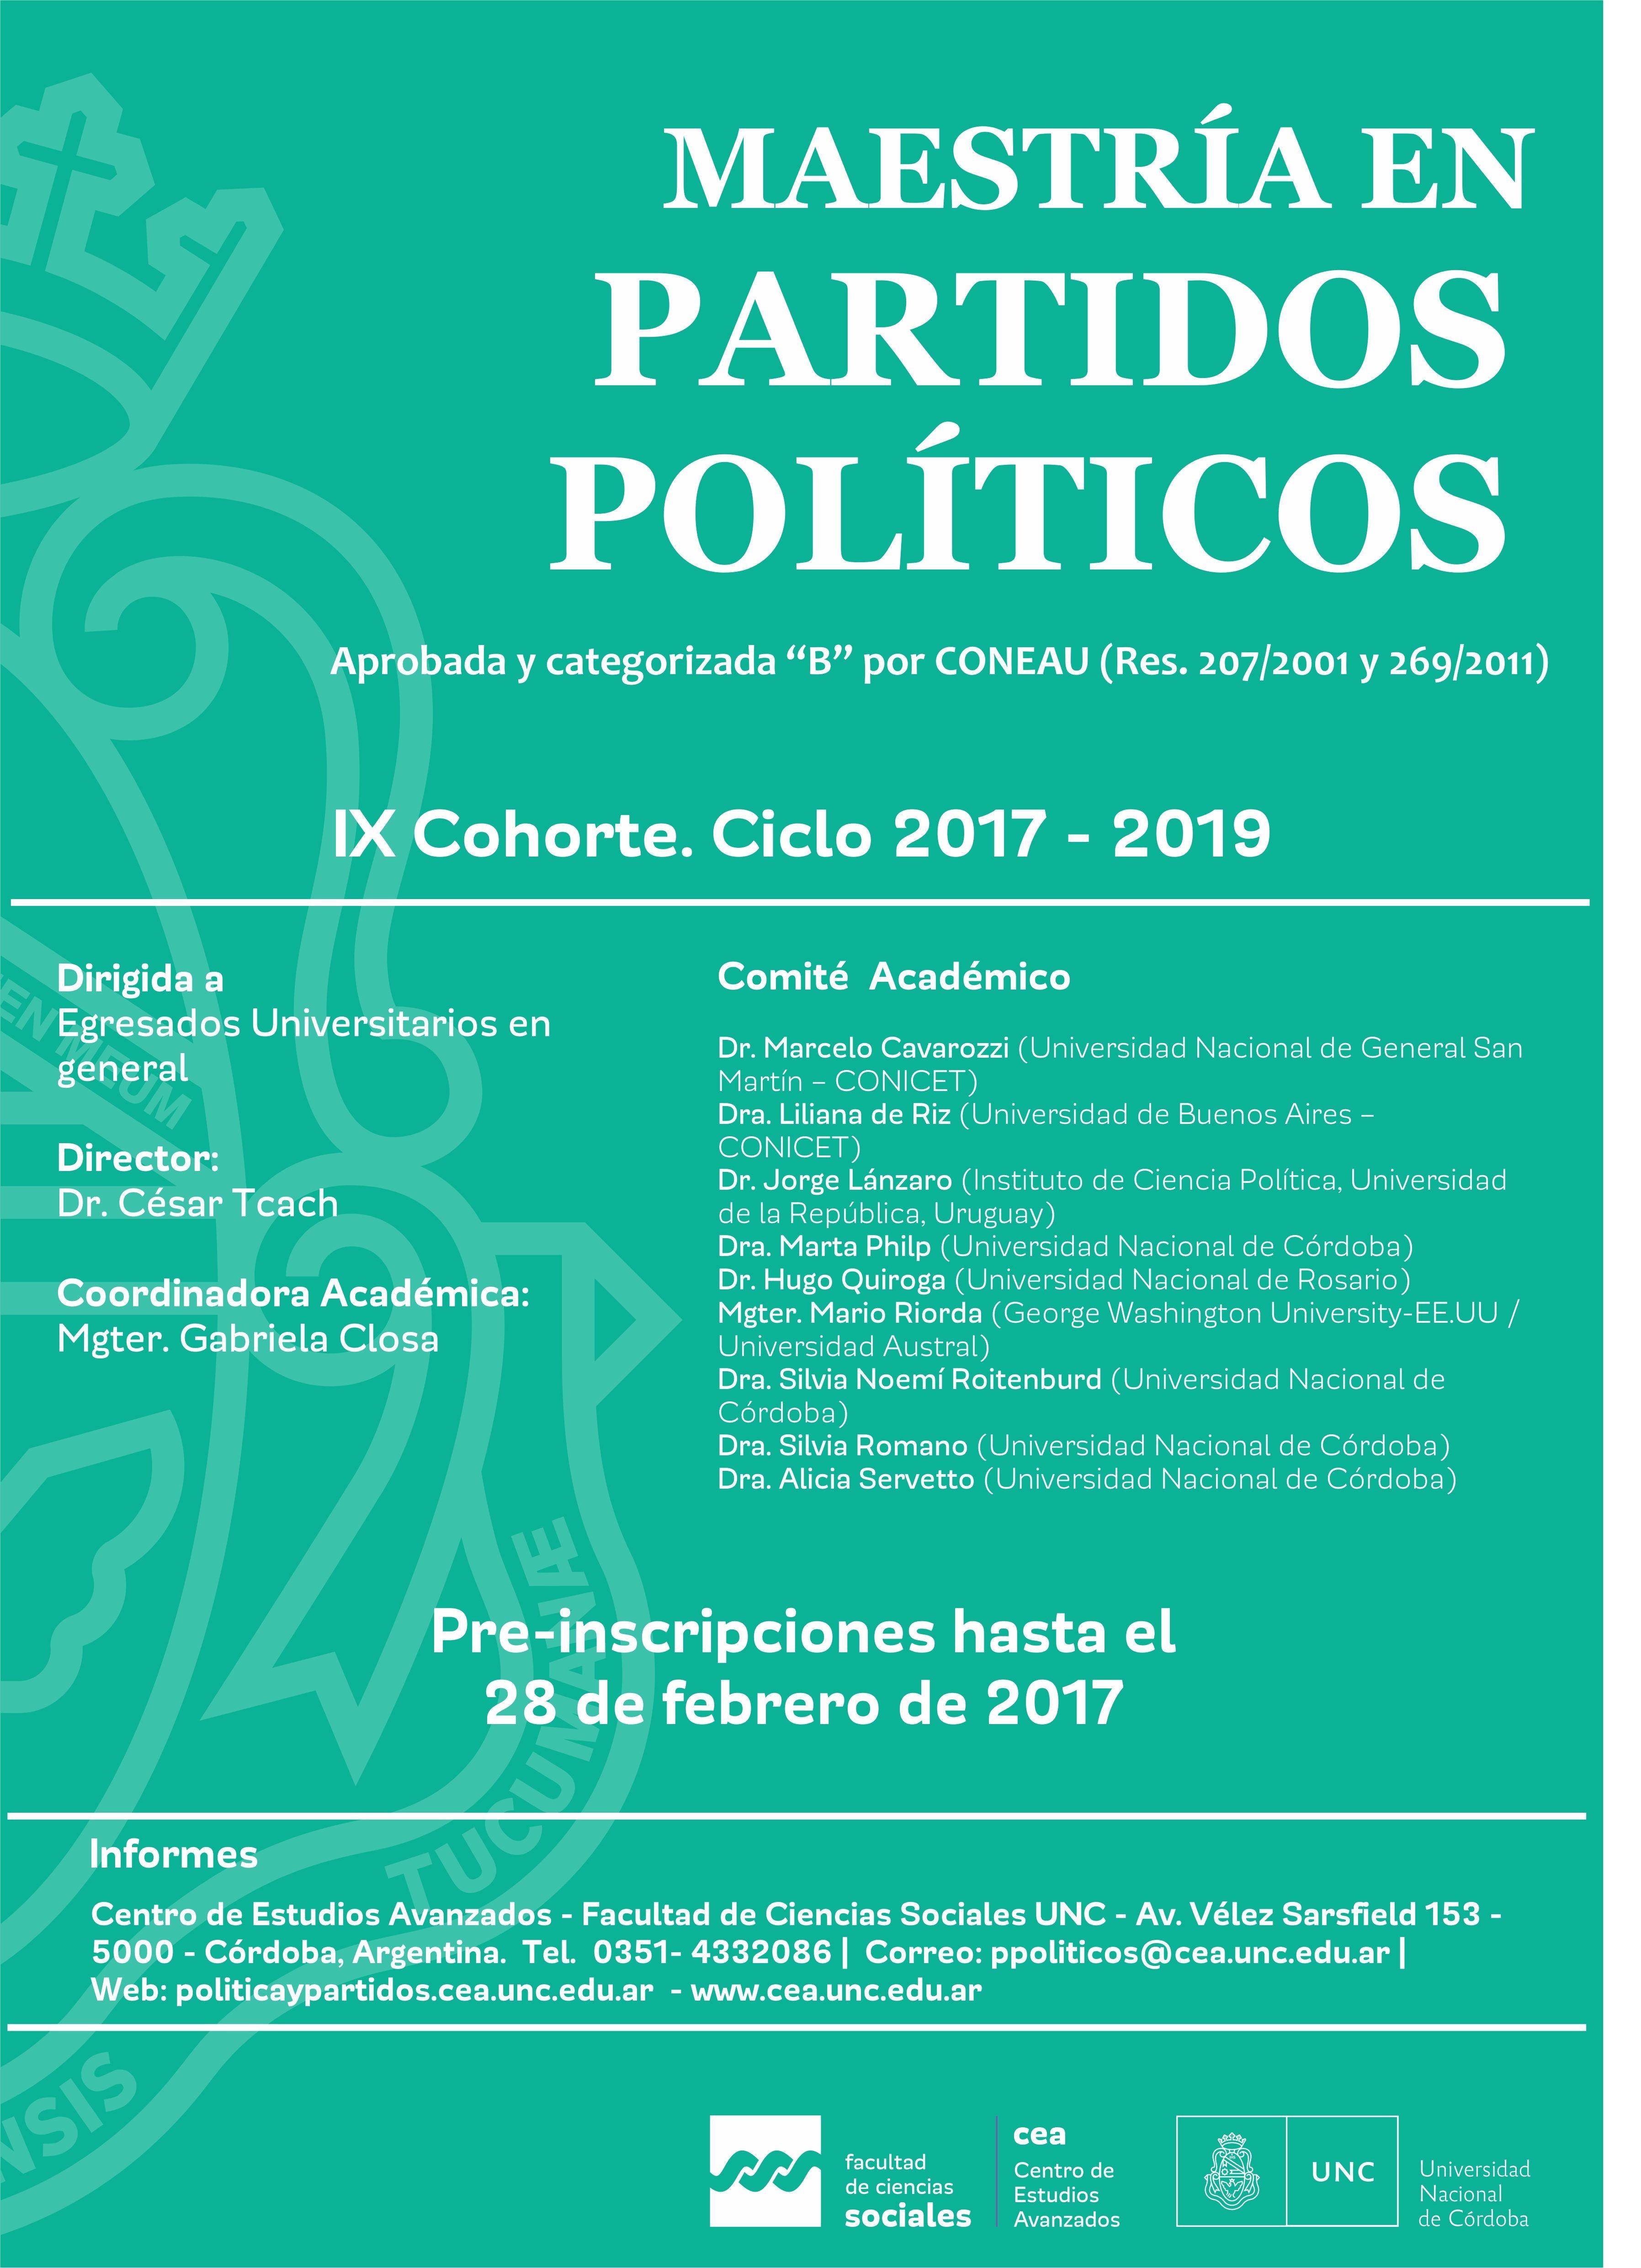 Calendario Escolar 2019 Cordoba Argentina Más Recientes Maestra En Partidos Polticos